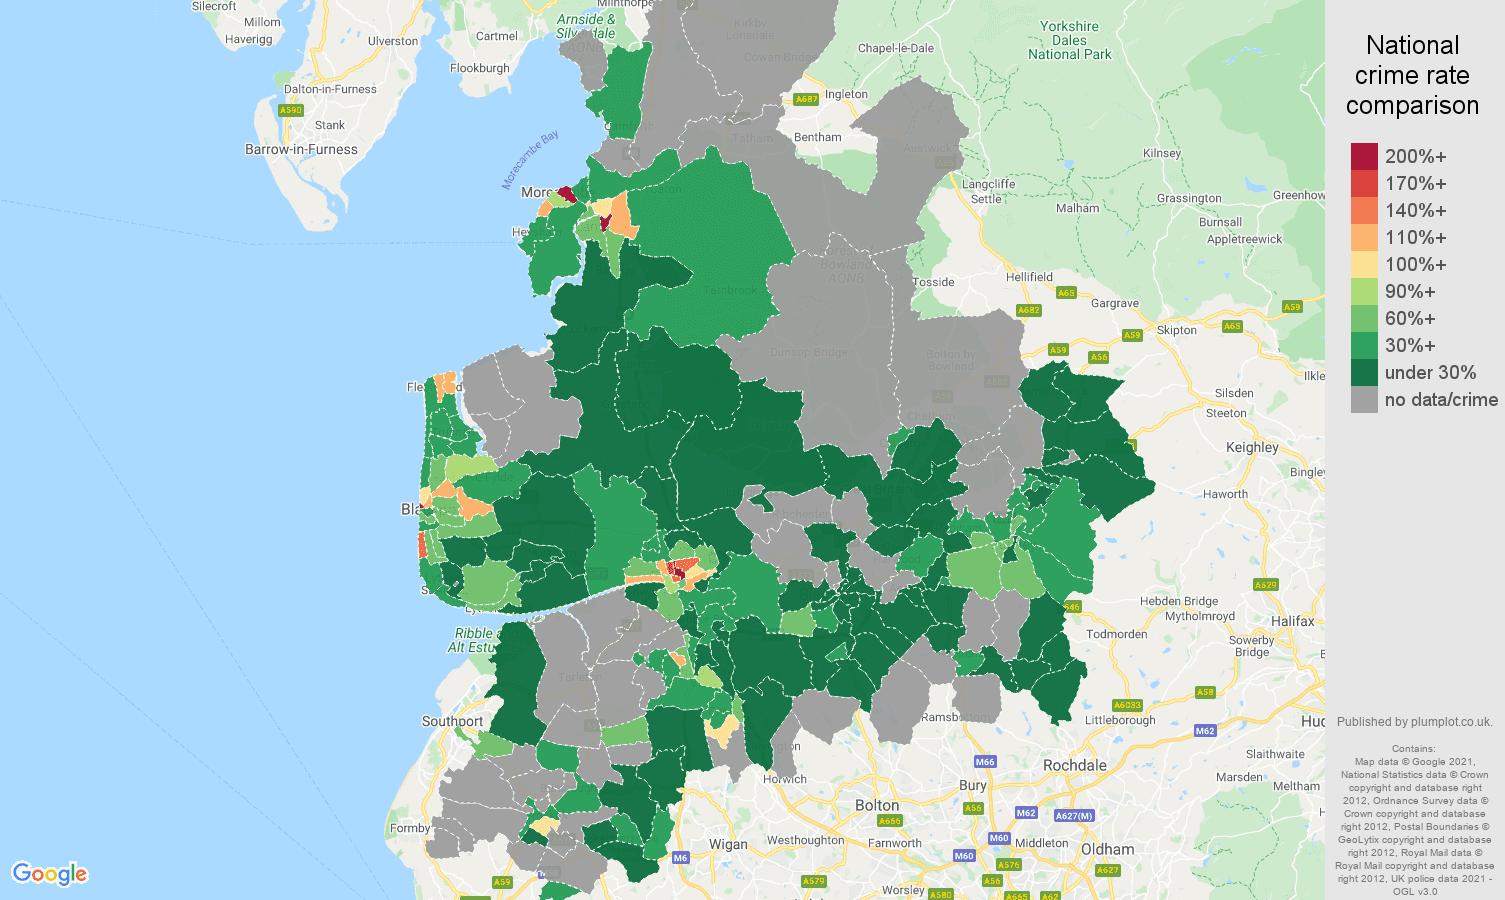 Lancashire bicycle theft crime rate comparison map